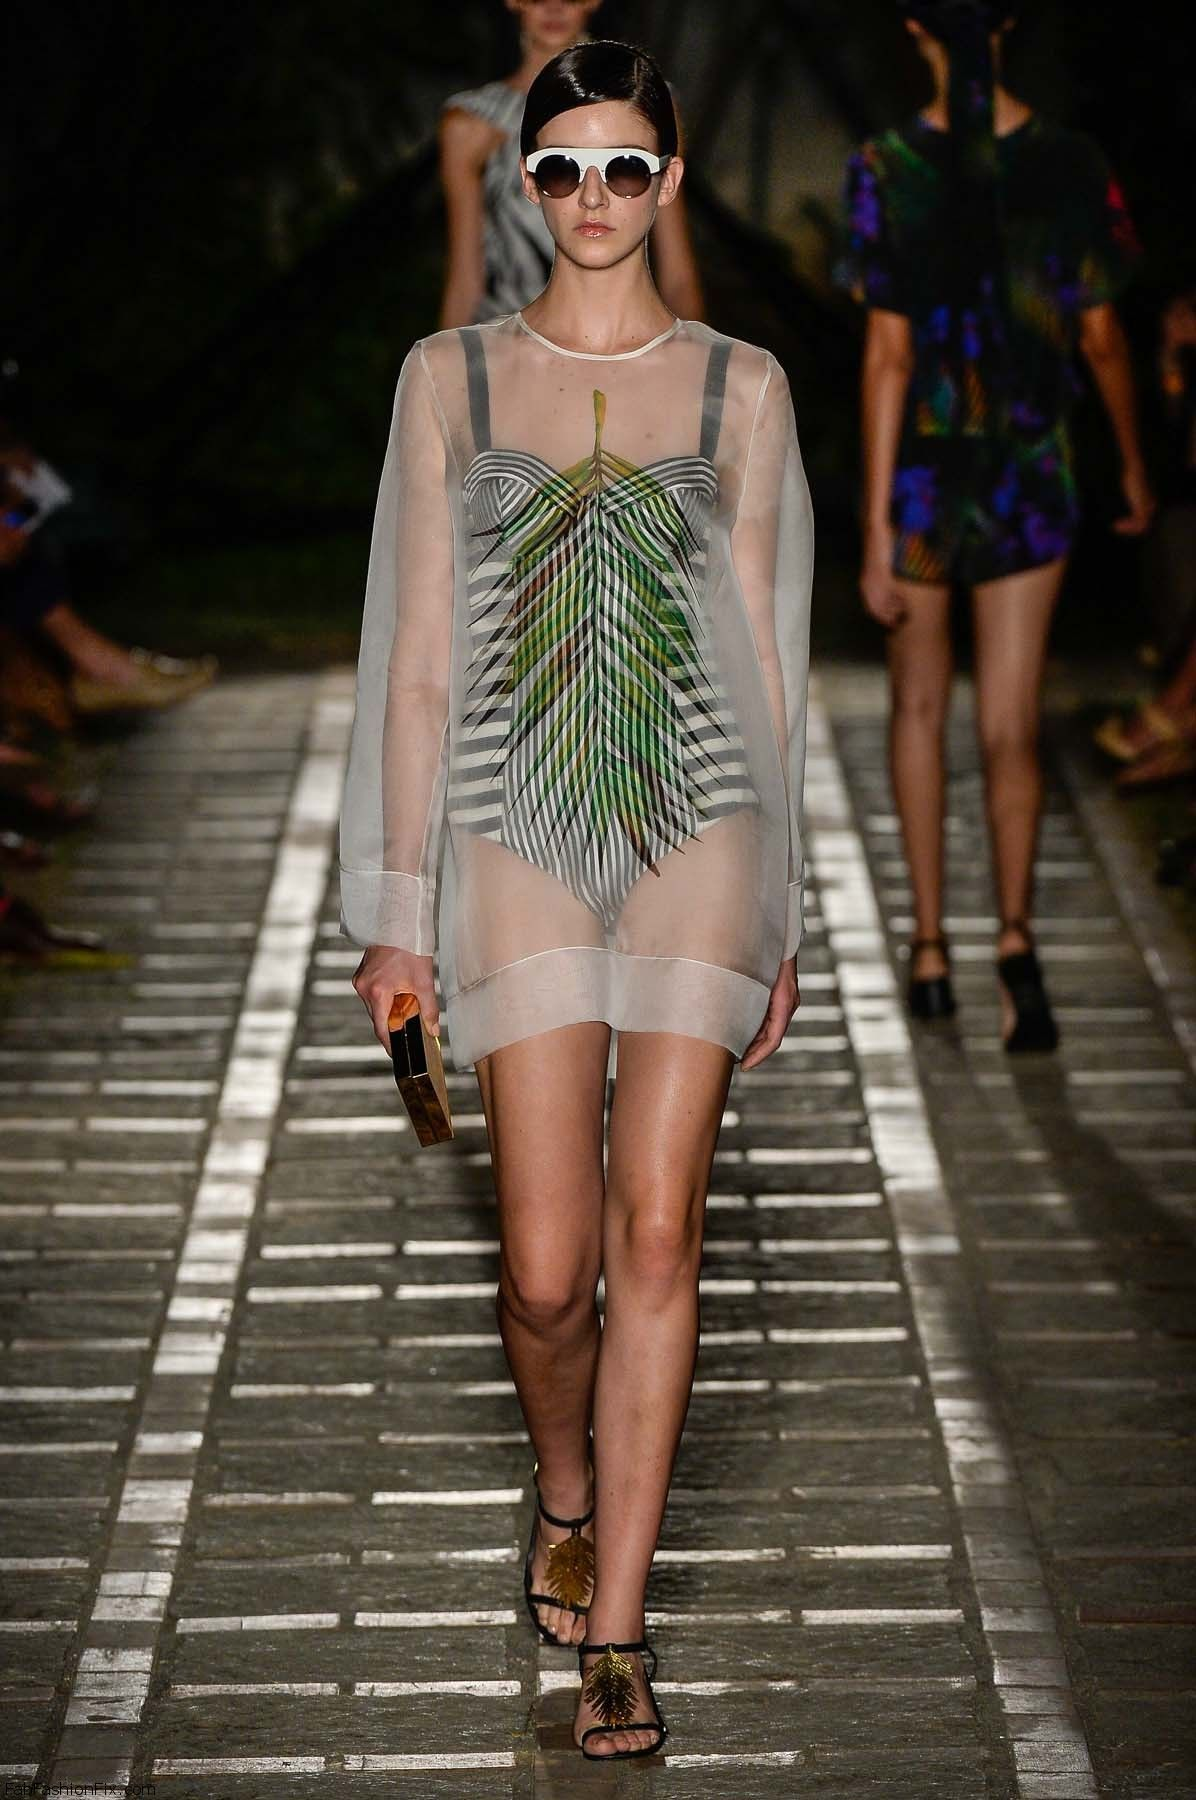 desfile-osklen-praia-fashion-rio-verao2015-127